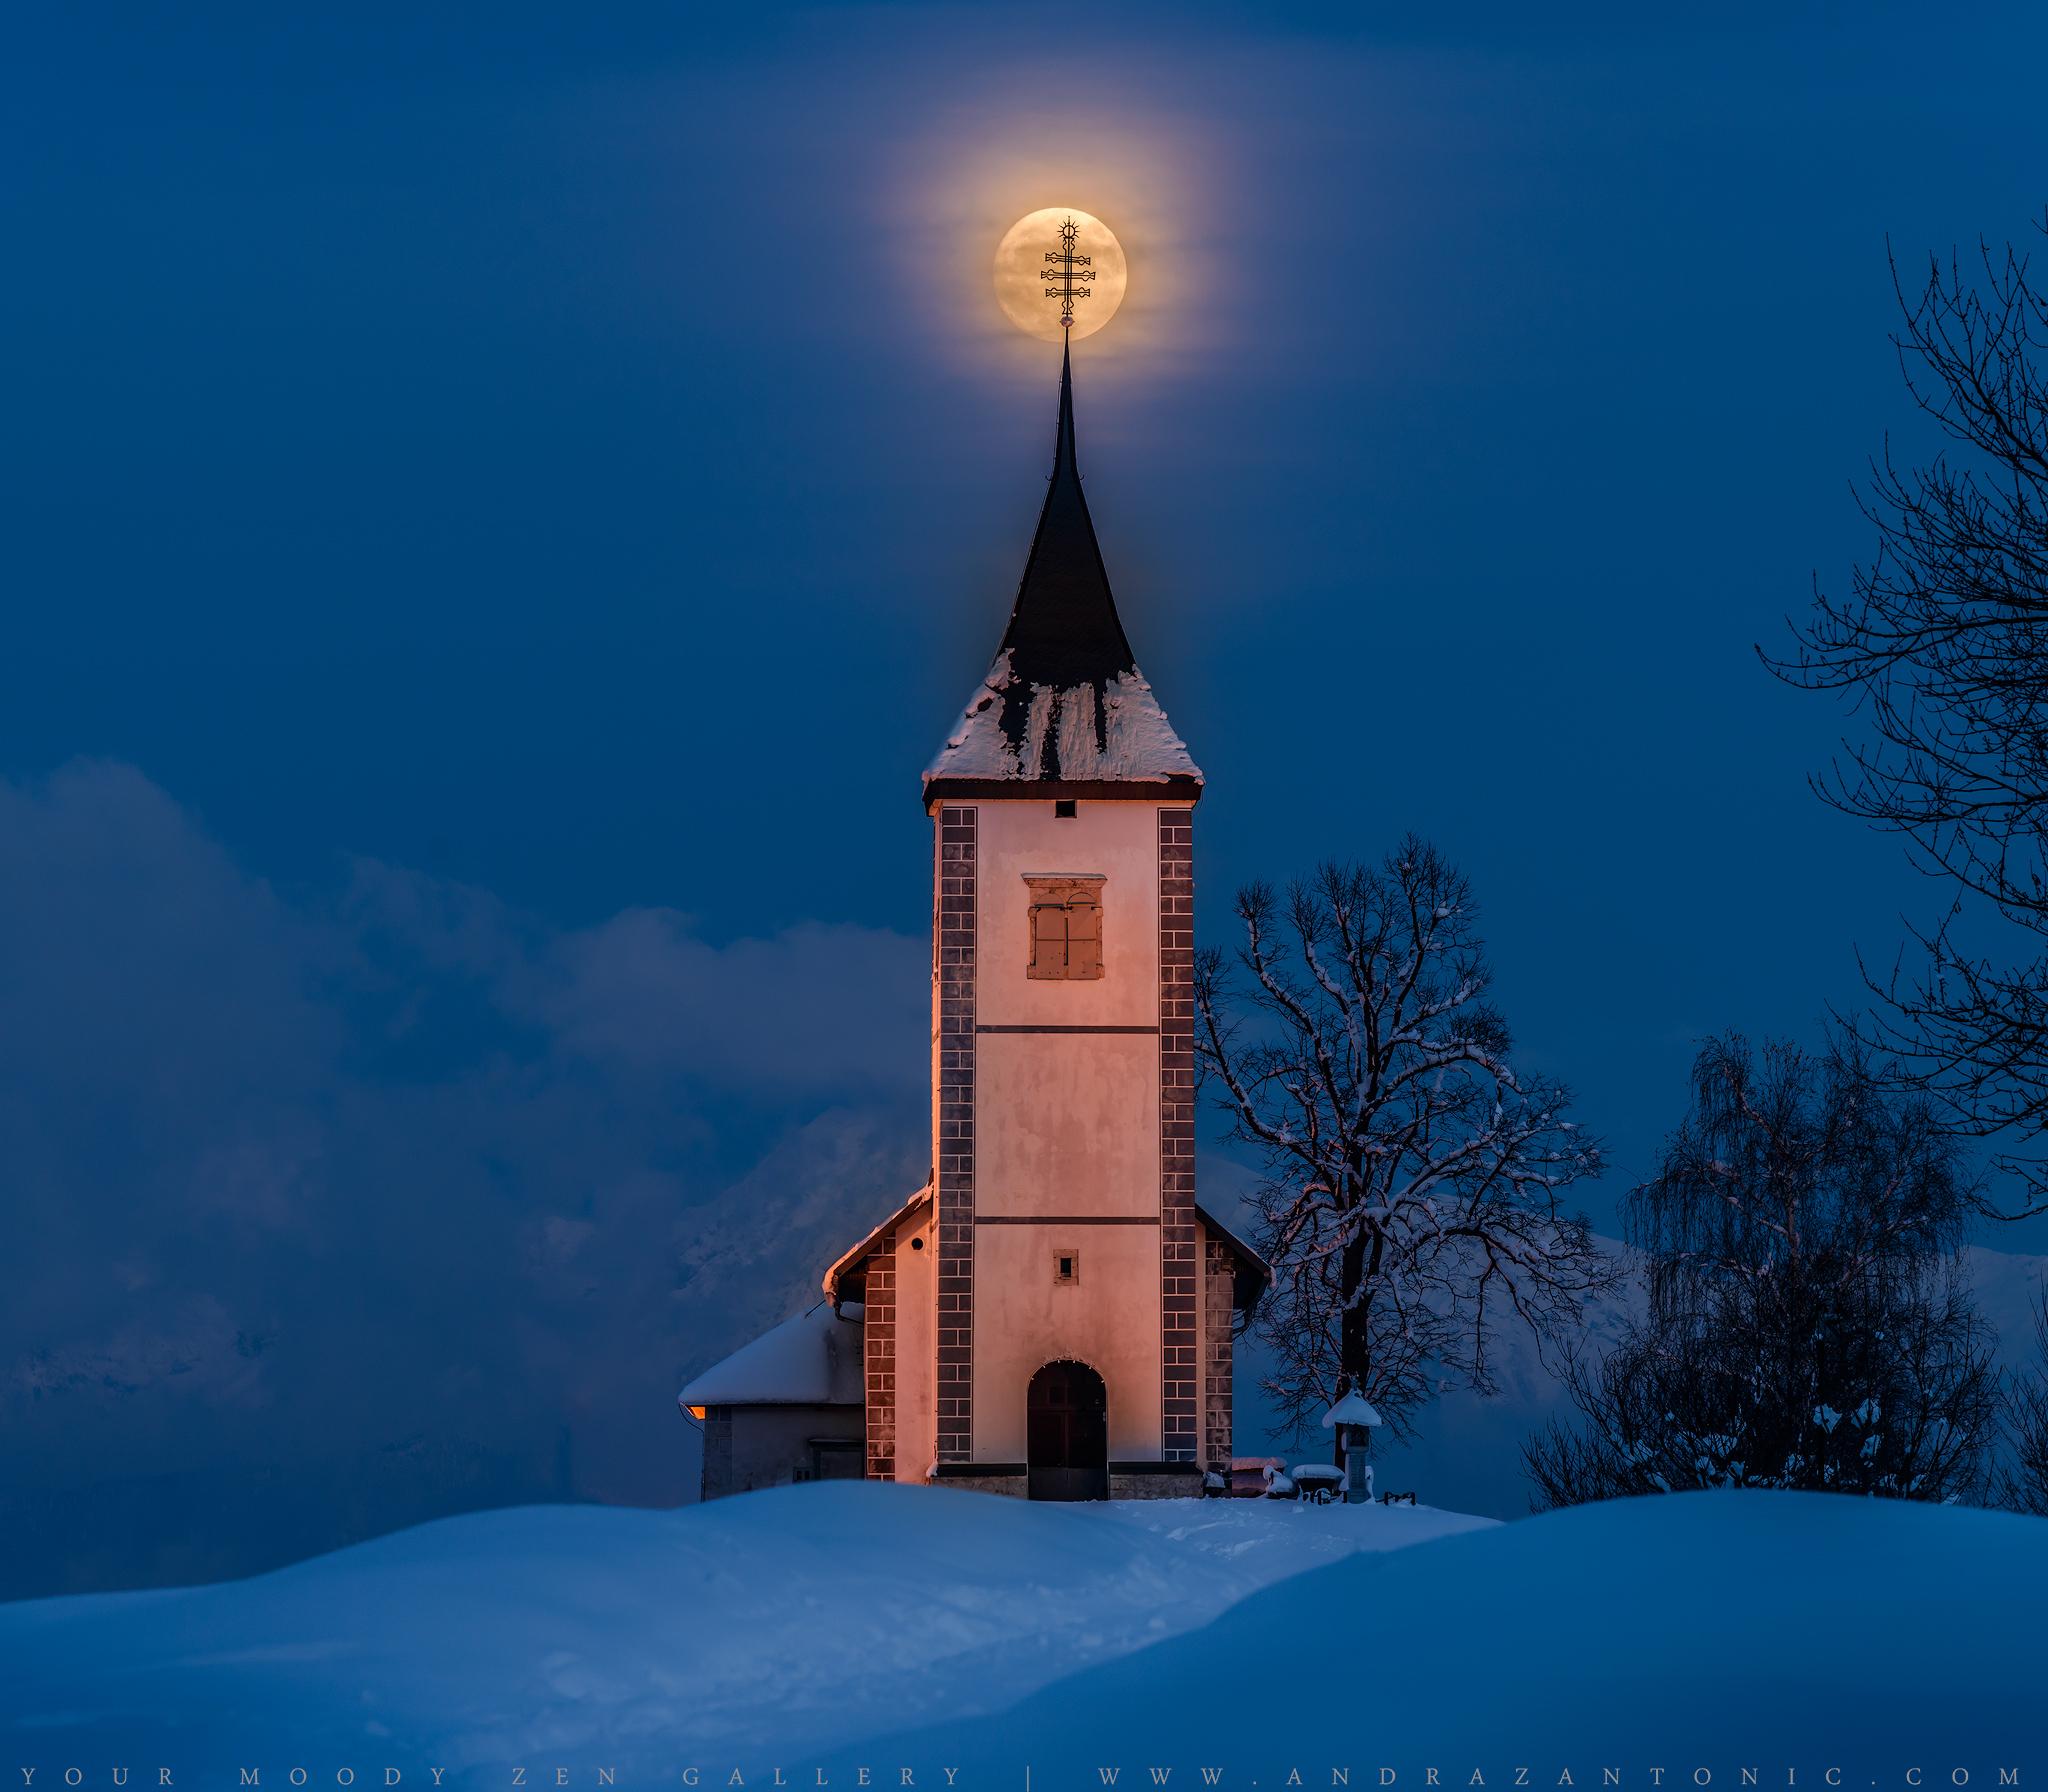 jamnik_moonrise.jpg